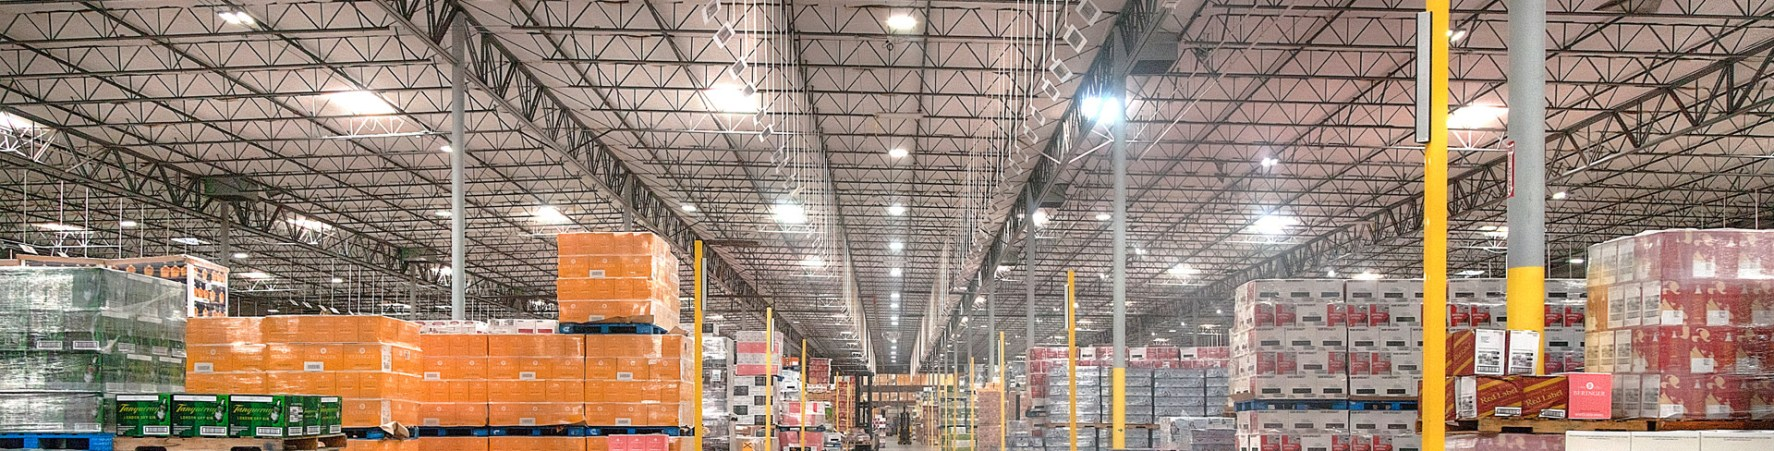 Industrial Warehouse Lighting Solutions | Relumination